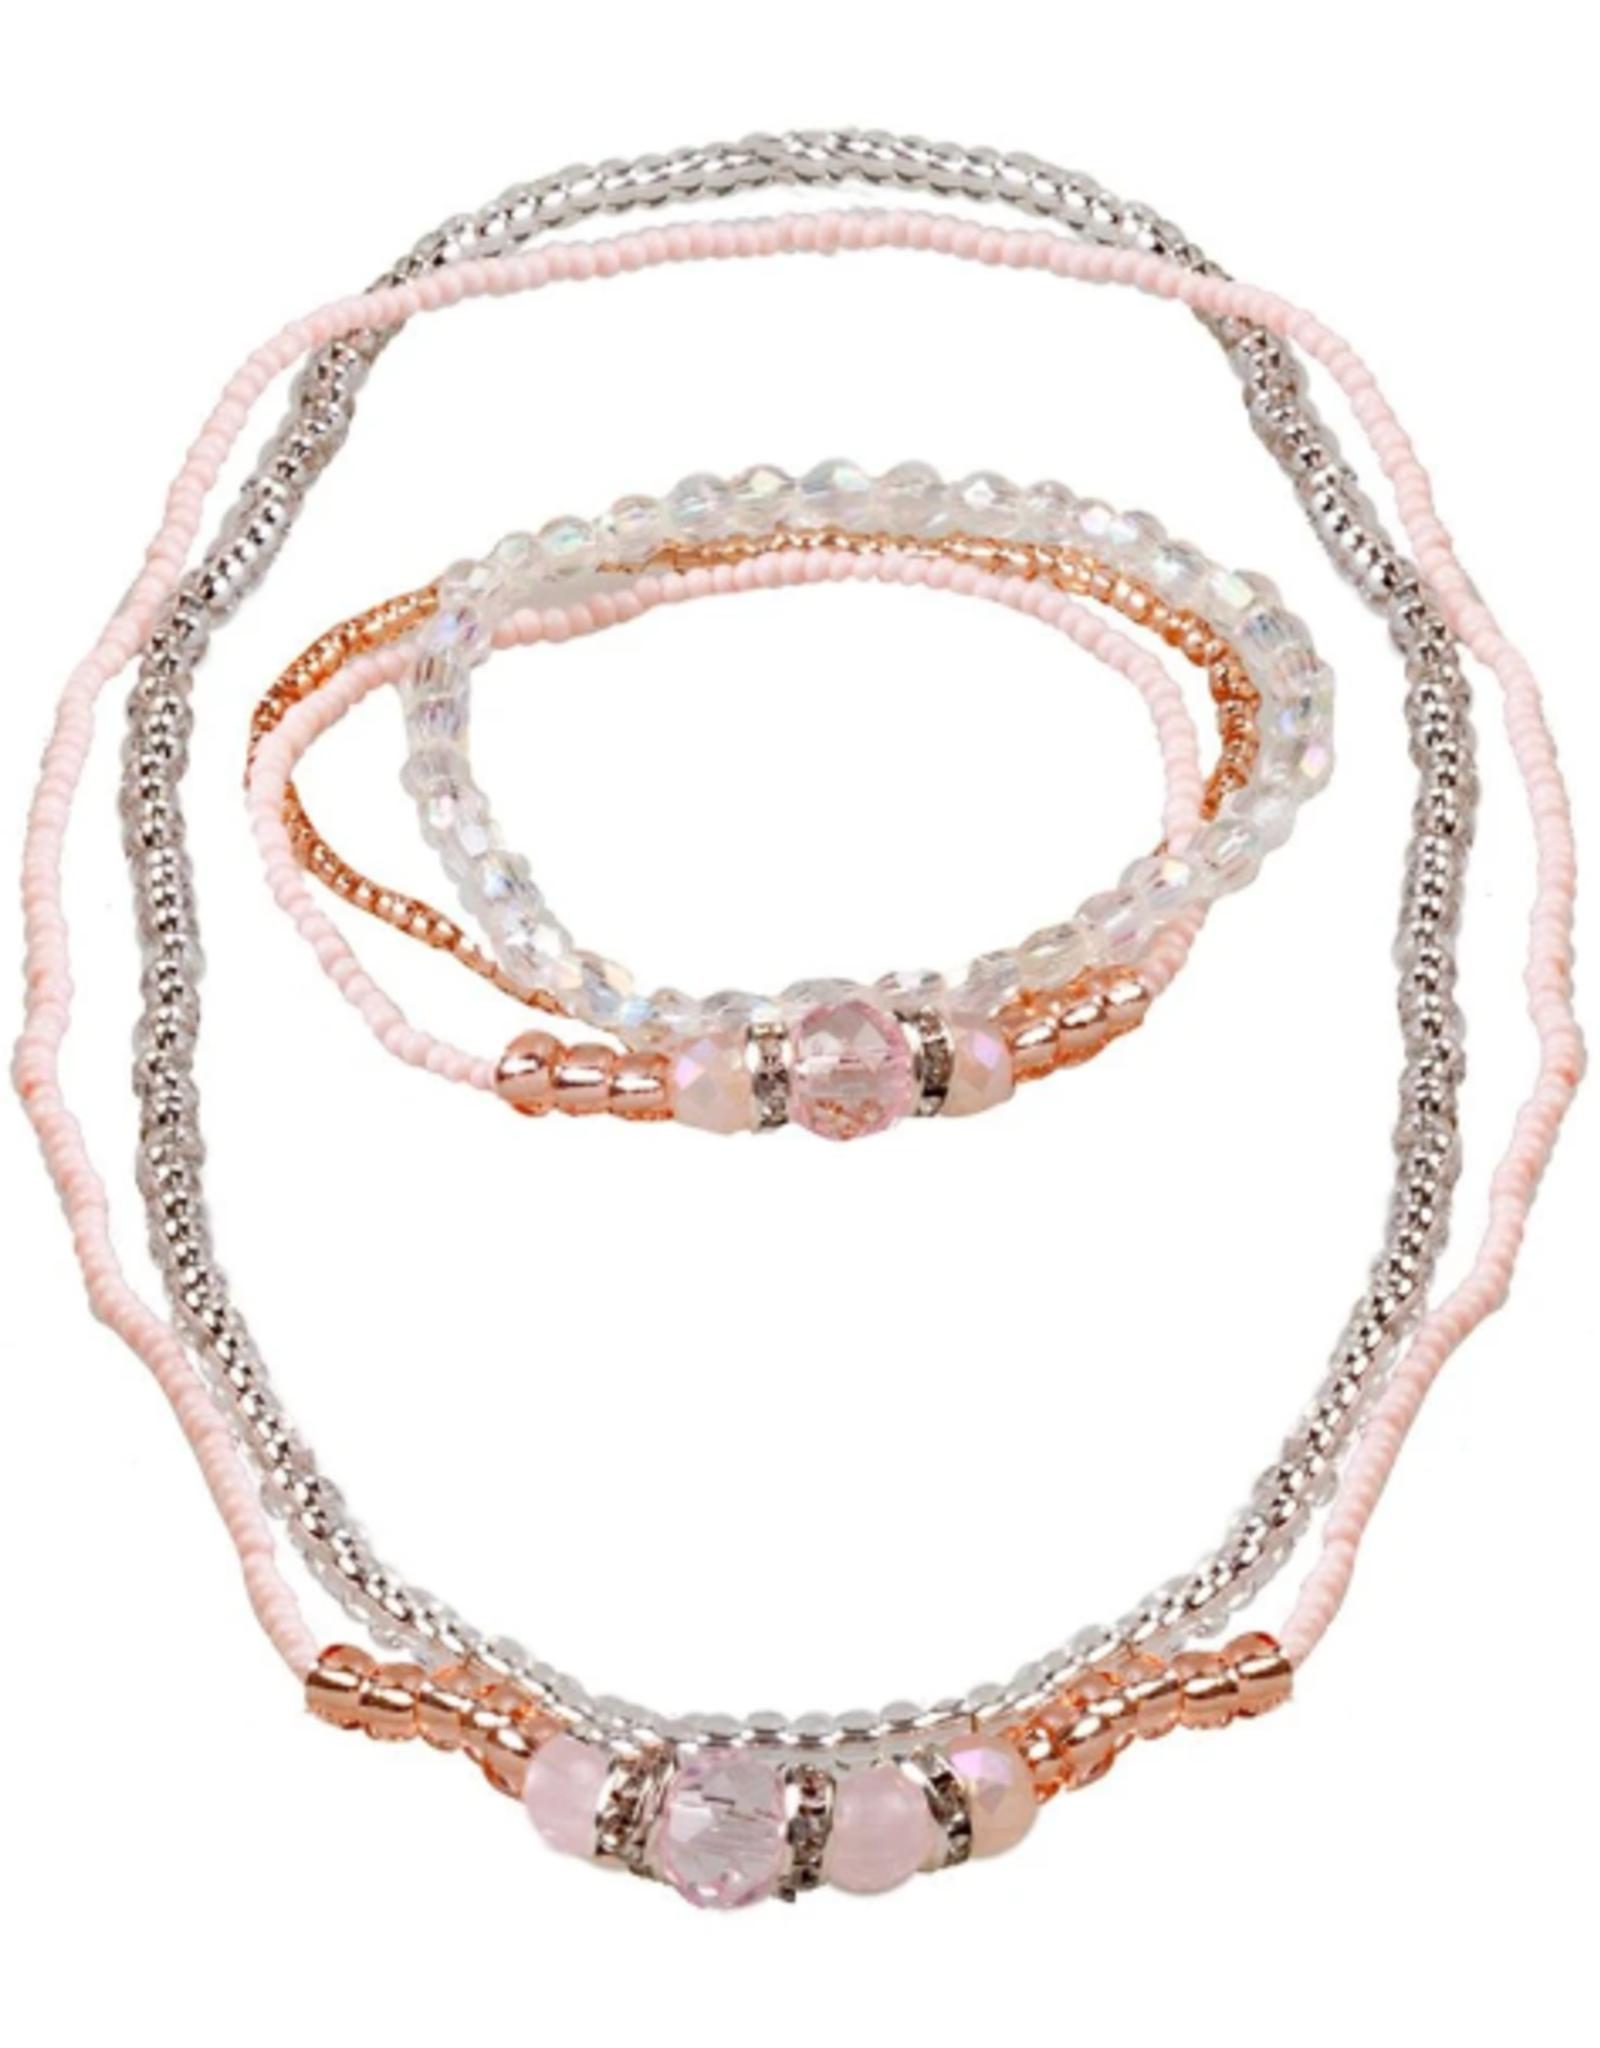 Great Pretenders Sweetie Pie Necklace & Bracelet Set